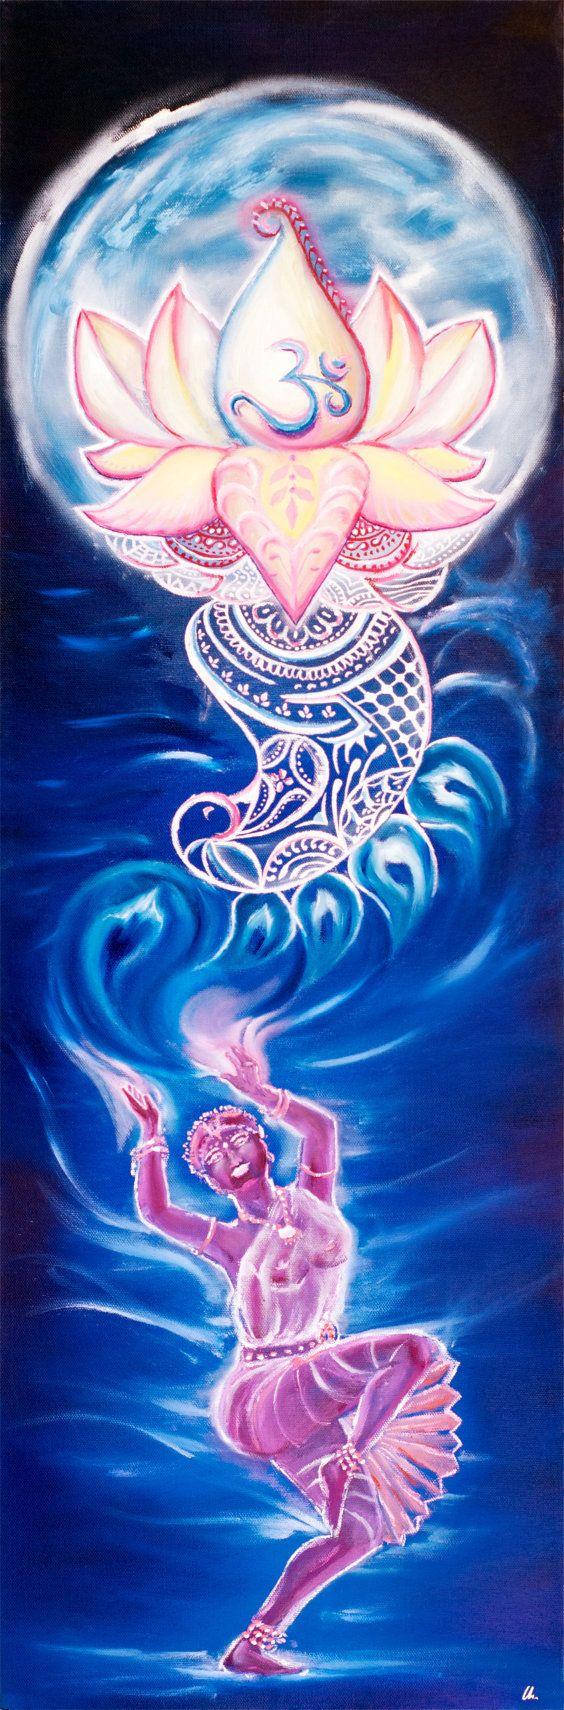 Nitya  Lotus Moon Dancer Series by MissSharda on Etsy